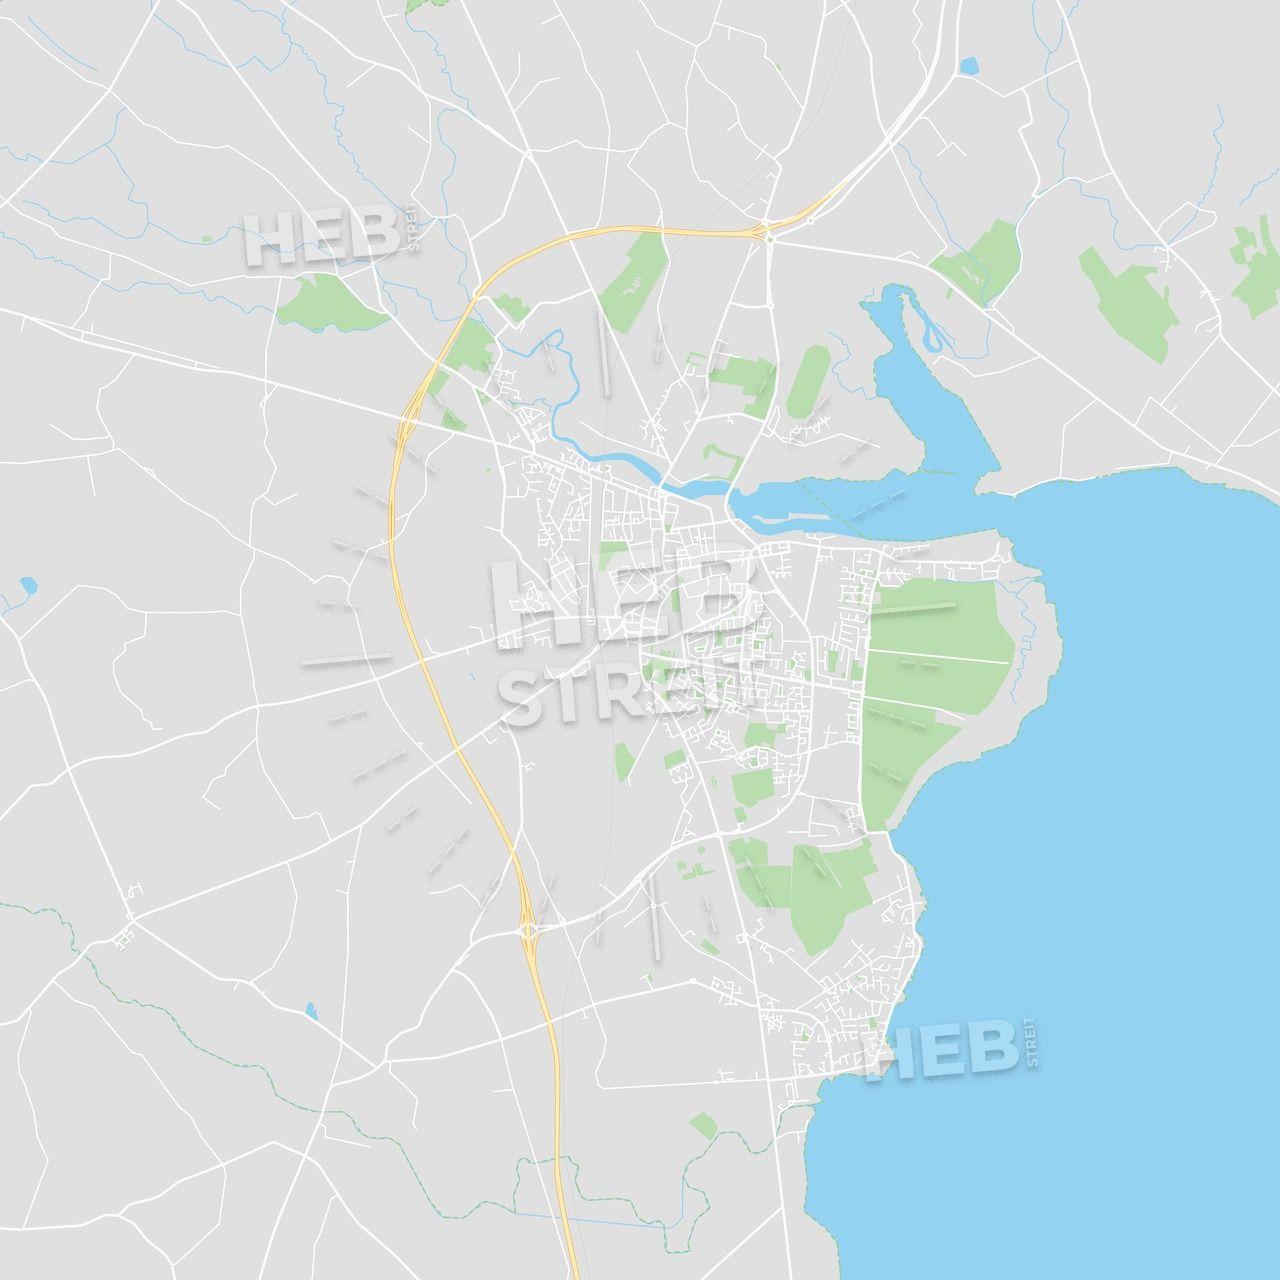 Dundalk Map Of Ireland.Dundalk Ireland Printable Street Map Maps Vector Downloads Map